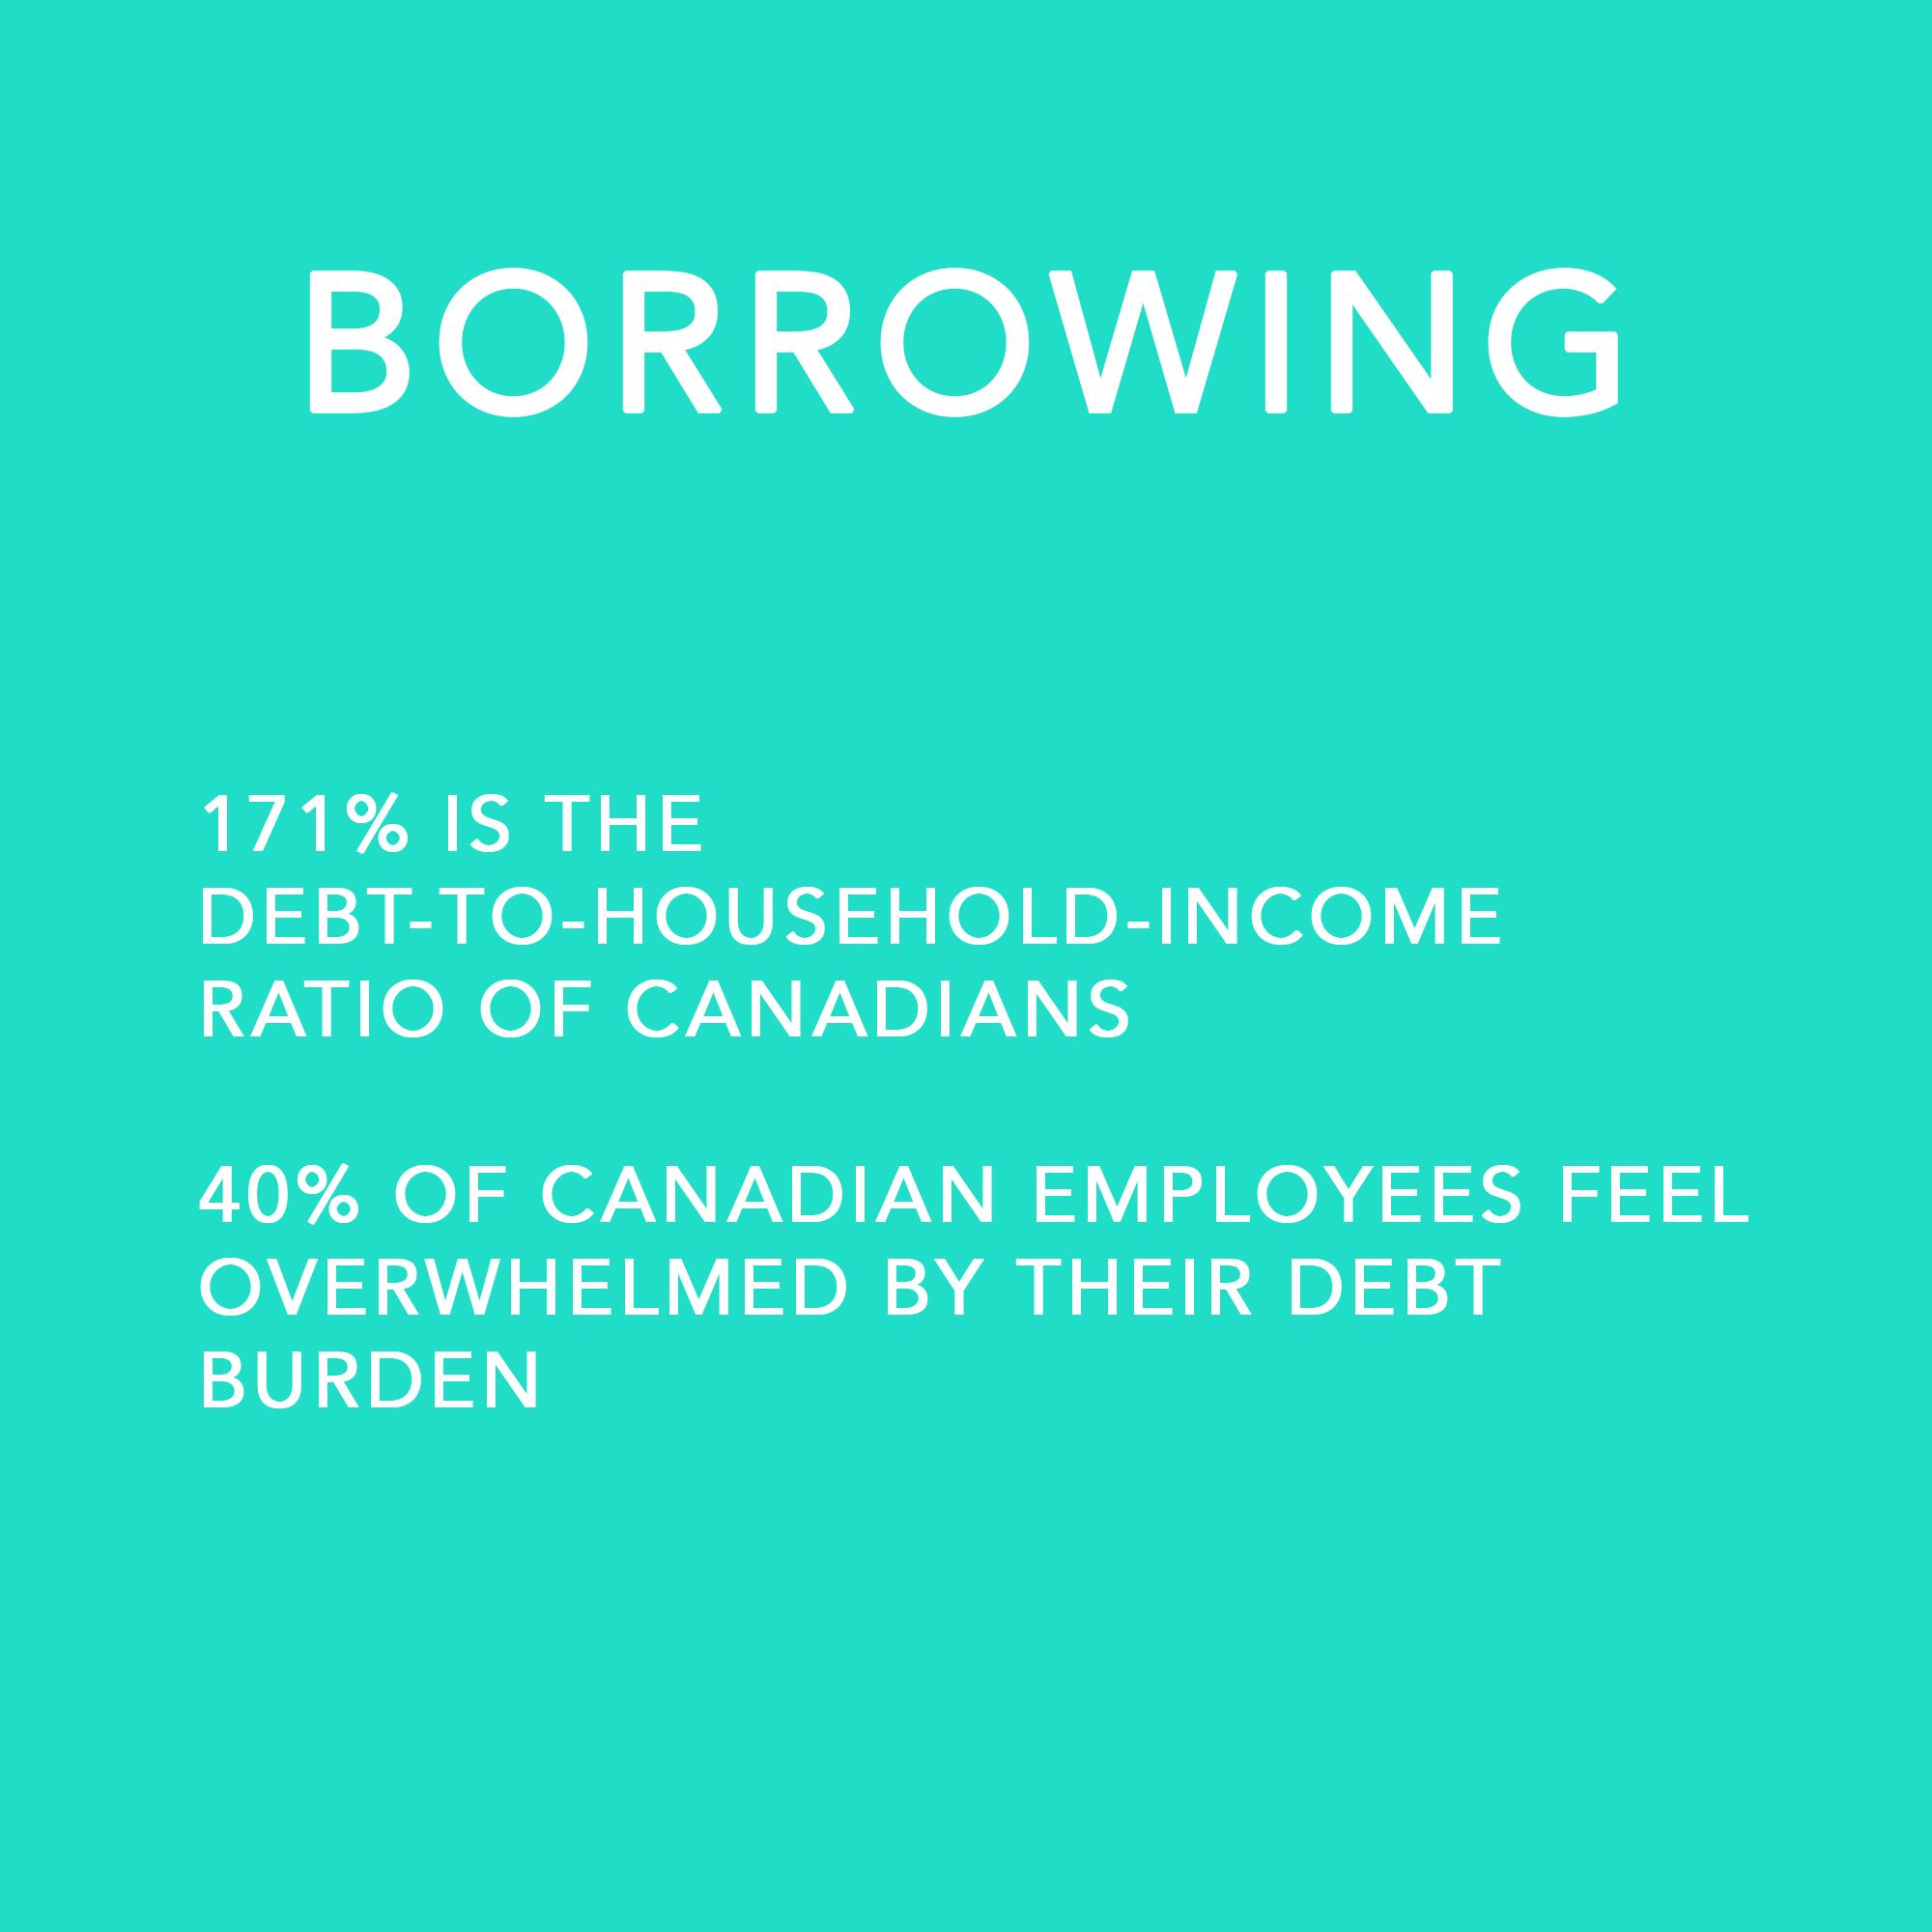 borrowing.jpg